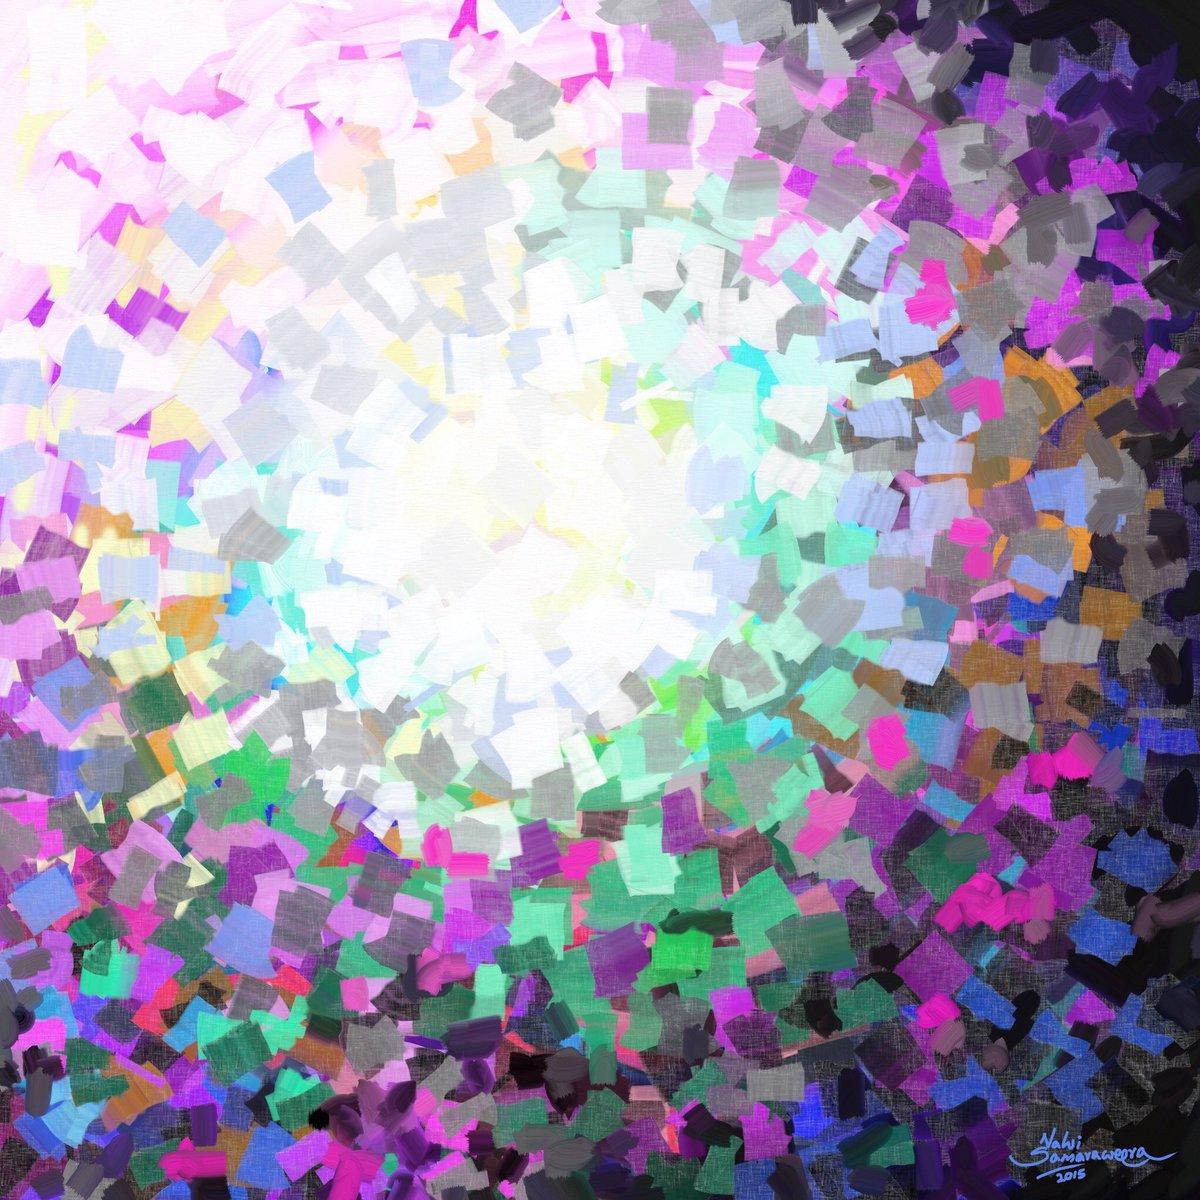 #colours express #feelings well.  It's #digital but it's still #FineArt. 🖼   🌐👉 https://www.artistsamaraweera.com/digitalstore/  #artist #abstractart #paint #deco #artwork #contemporaryart #abstractartist #abstractexpressionism #2pointperspective #designthinking #interiordesign #housedeco #wallpaper